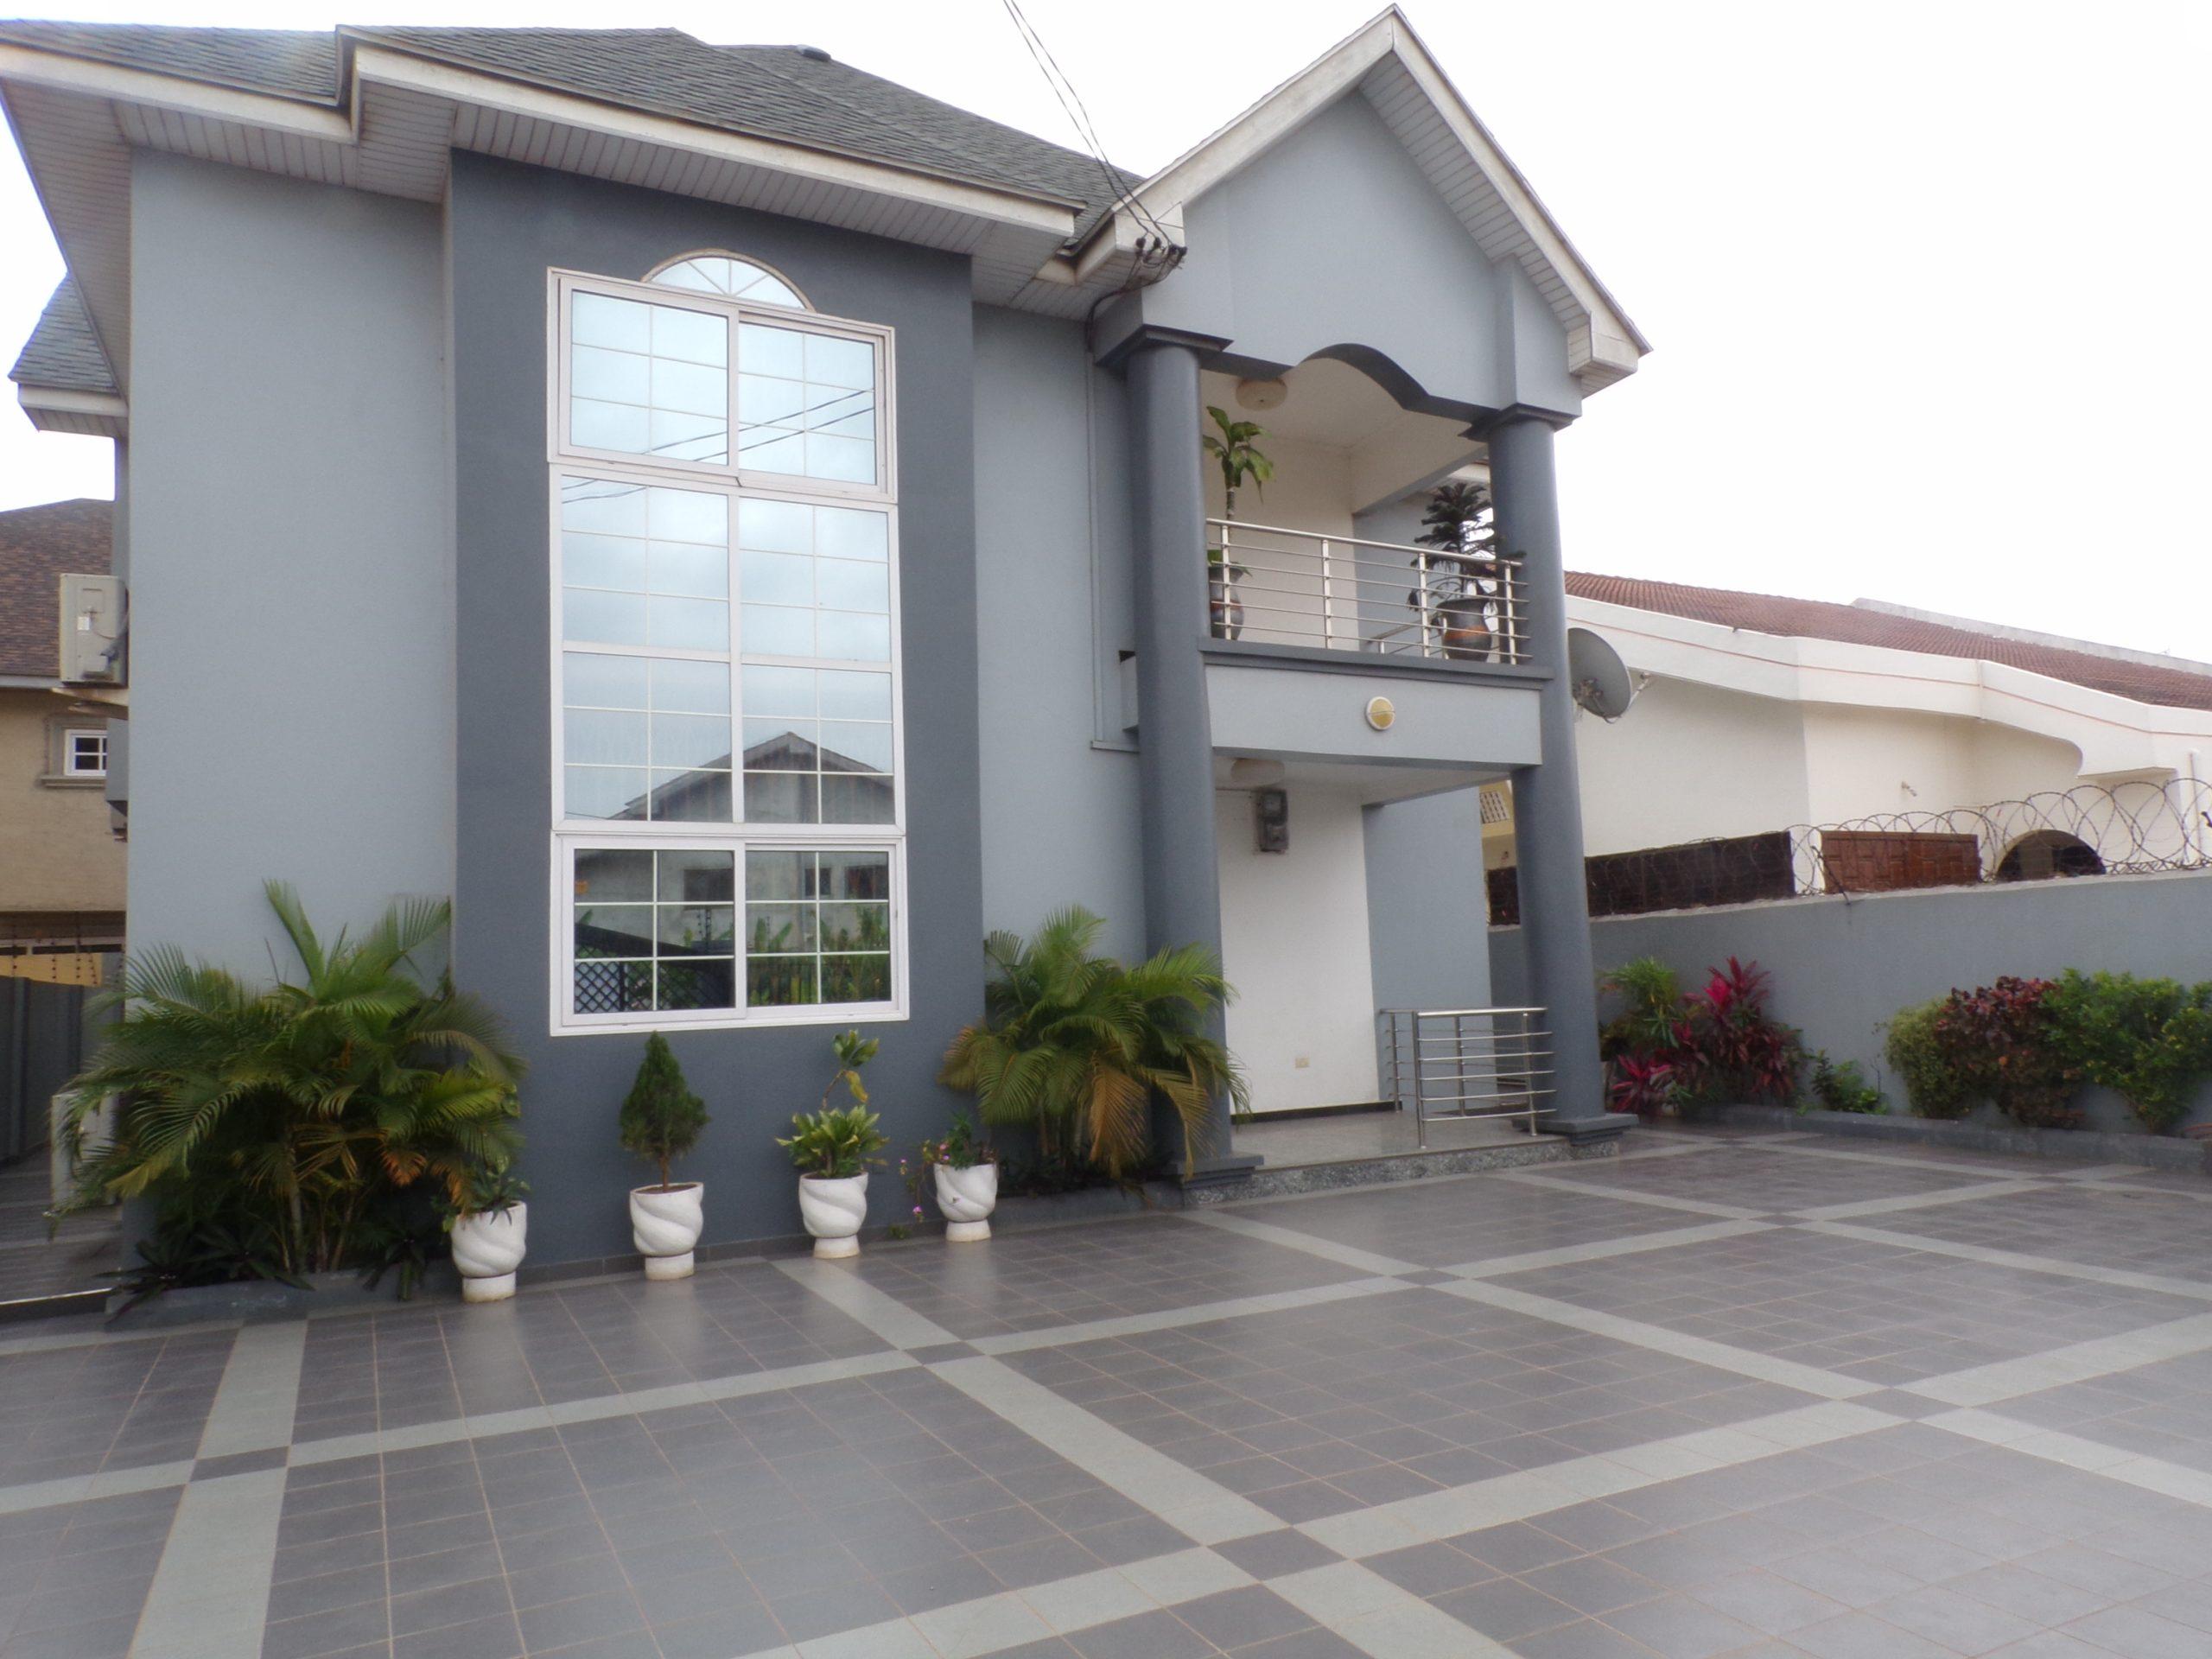 5 bedroom House for Rent in Adjiringanor